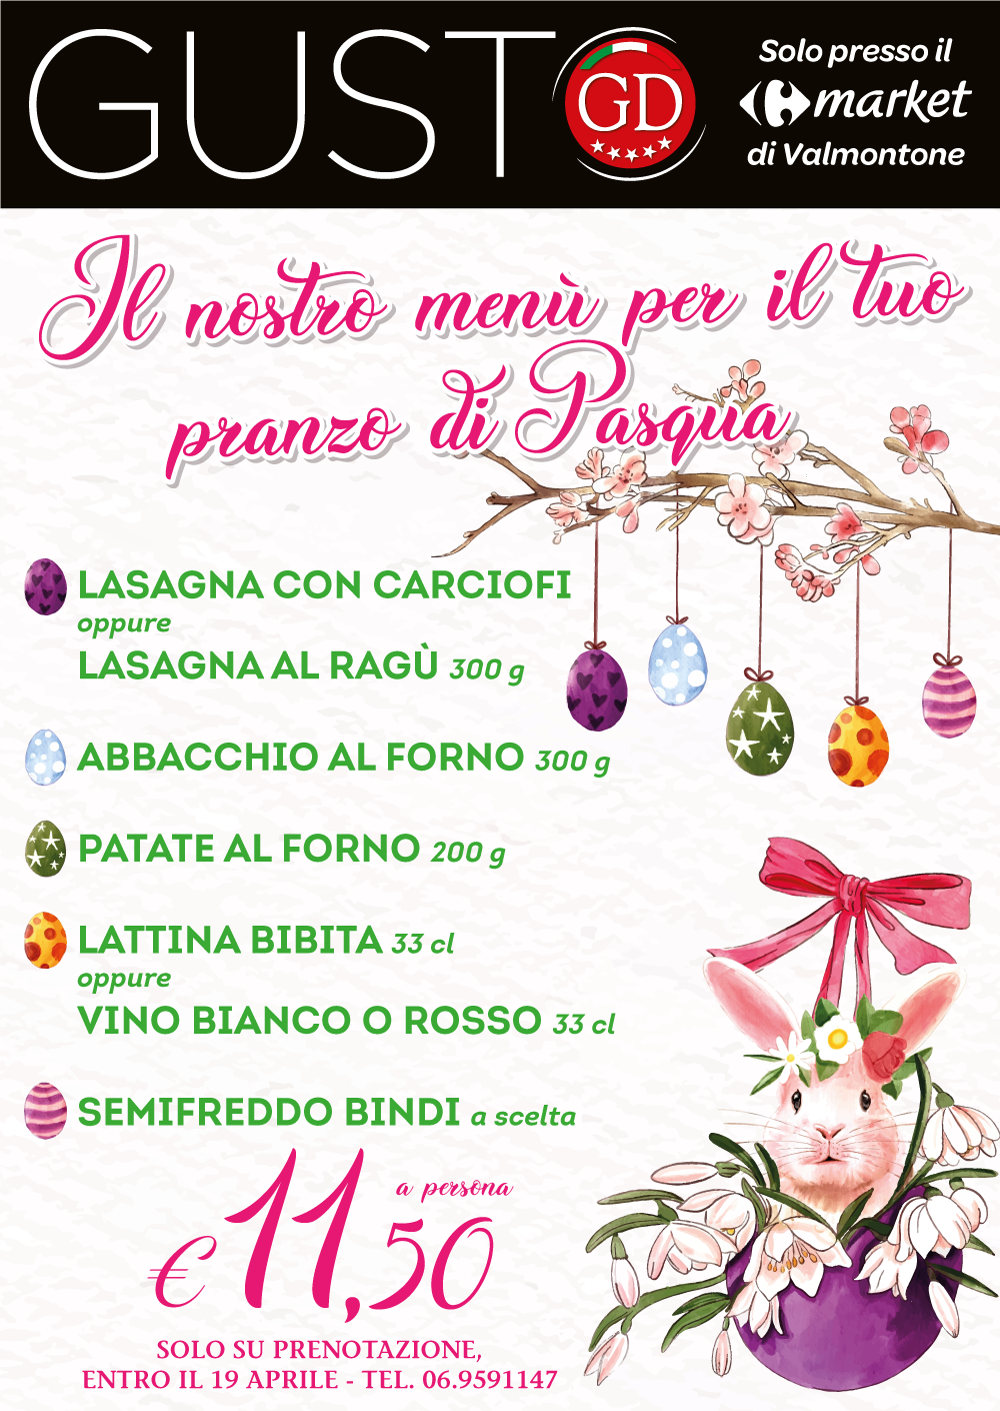 gusto-gd_valmontone_tavola-calda-pinseria-pasqua